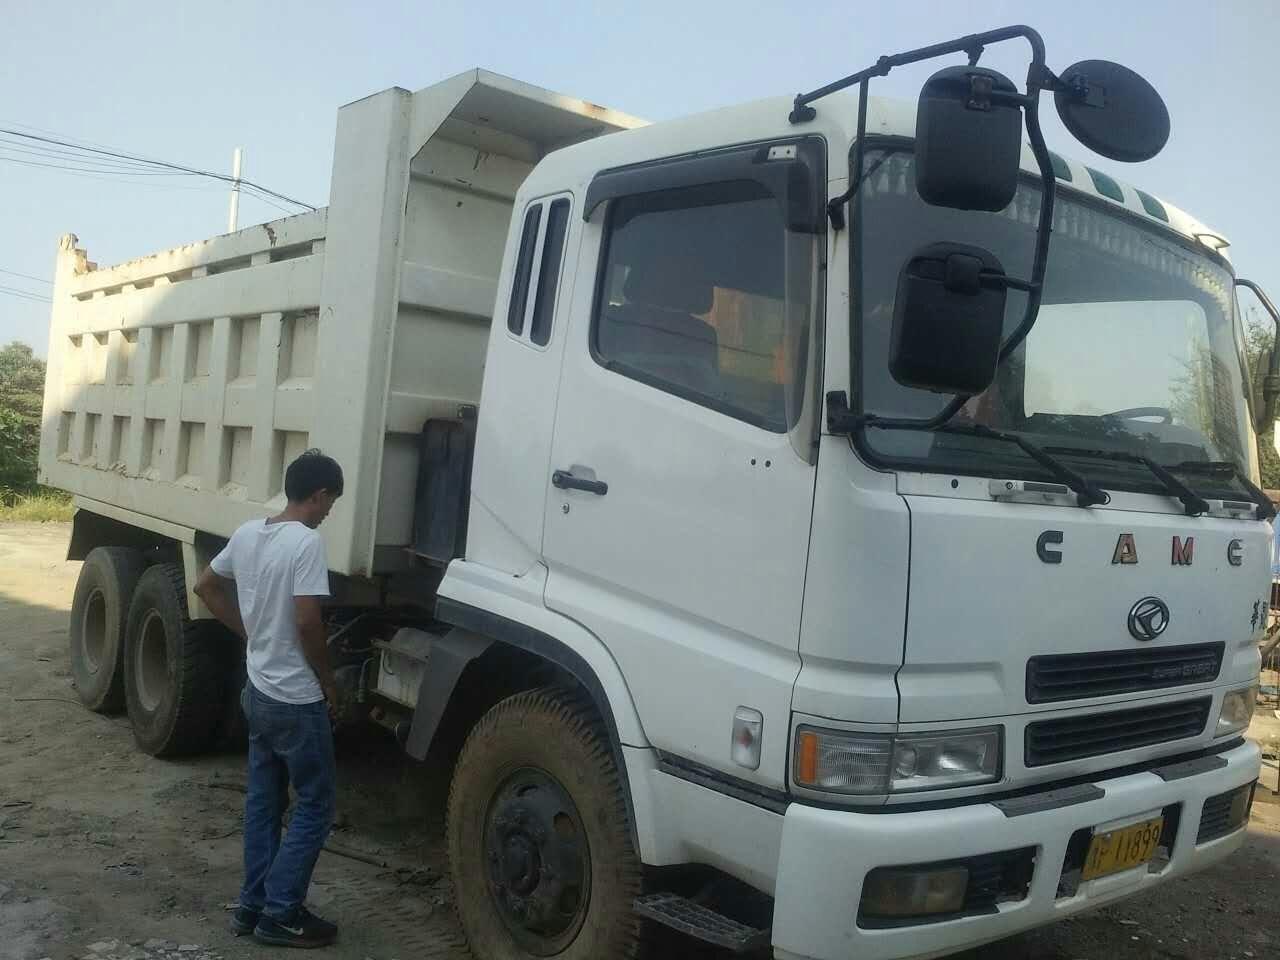 2005 used dump truck for sale 5000 hours made in Japan capacity 30T Isuzu UD Nissasn Mitsubishi dumper